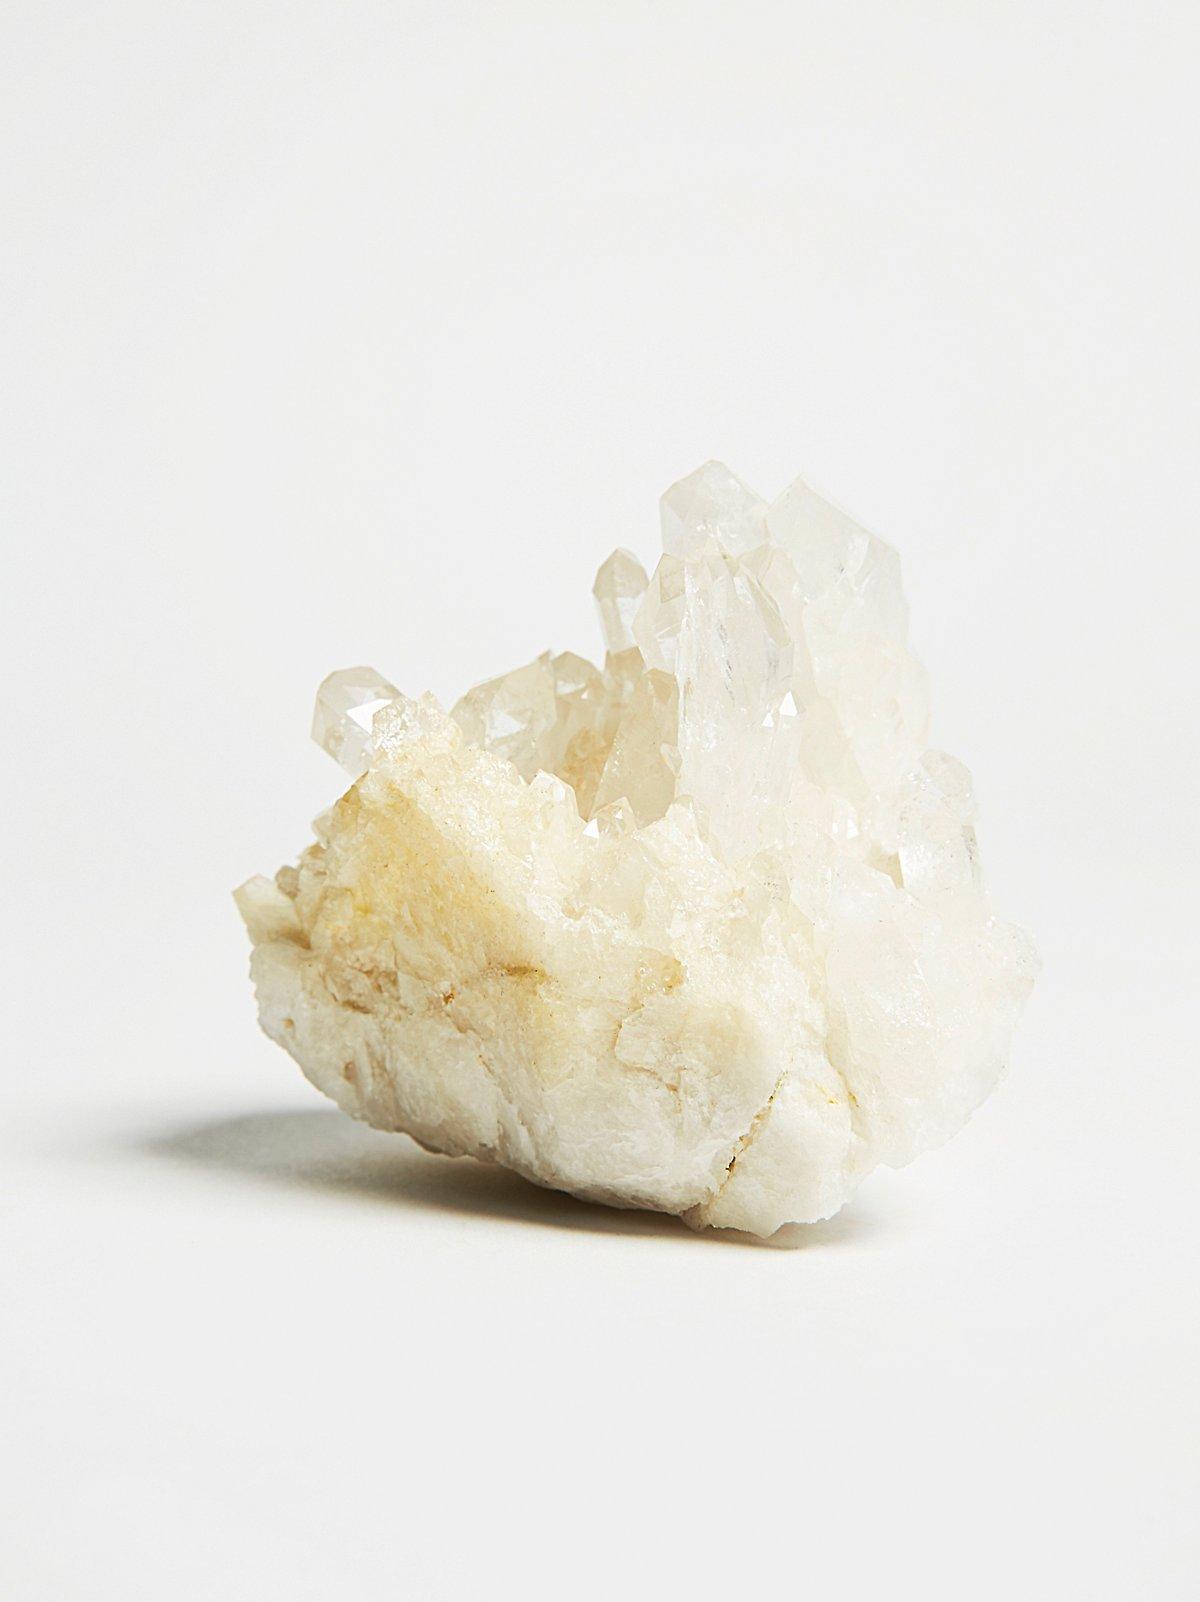 Vintage Quartz Crystal